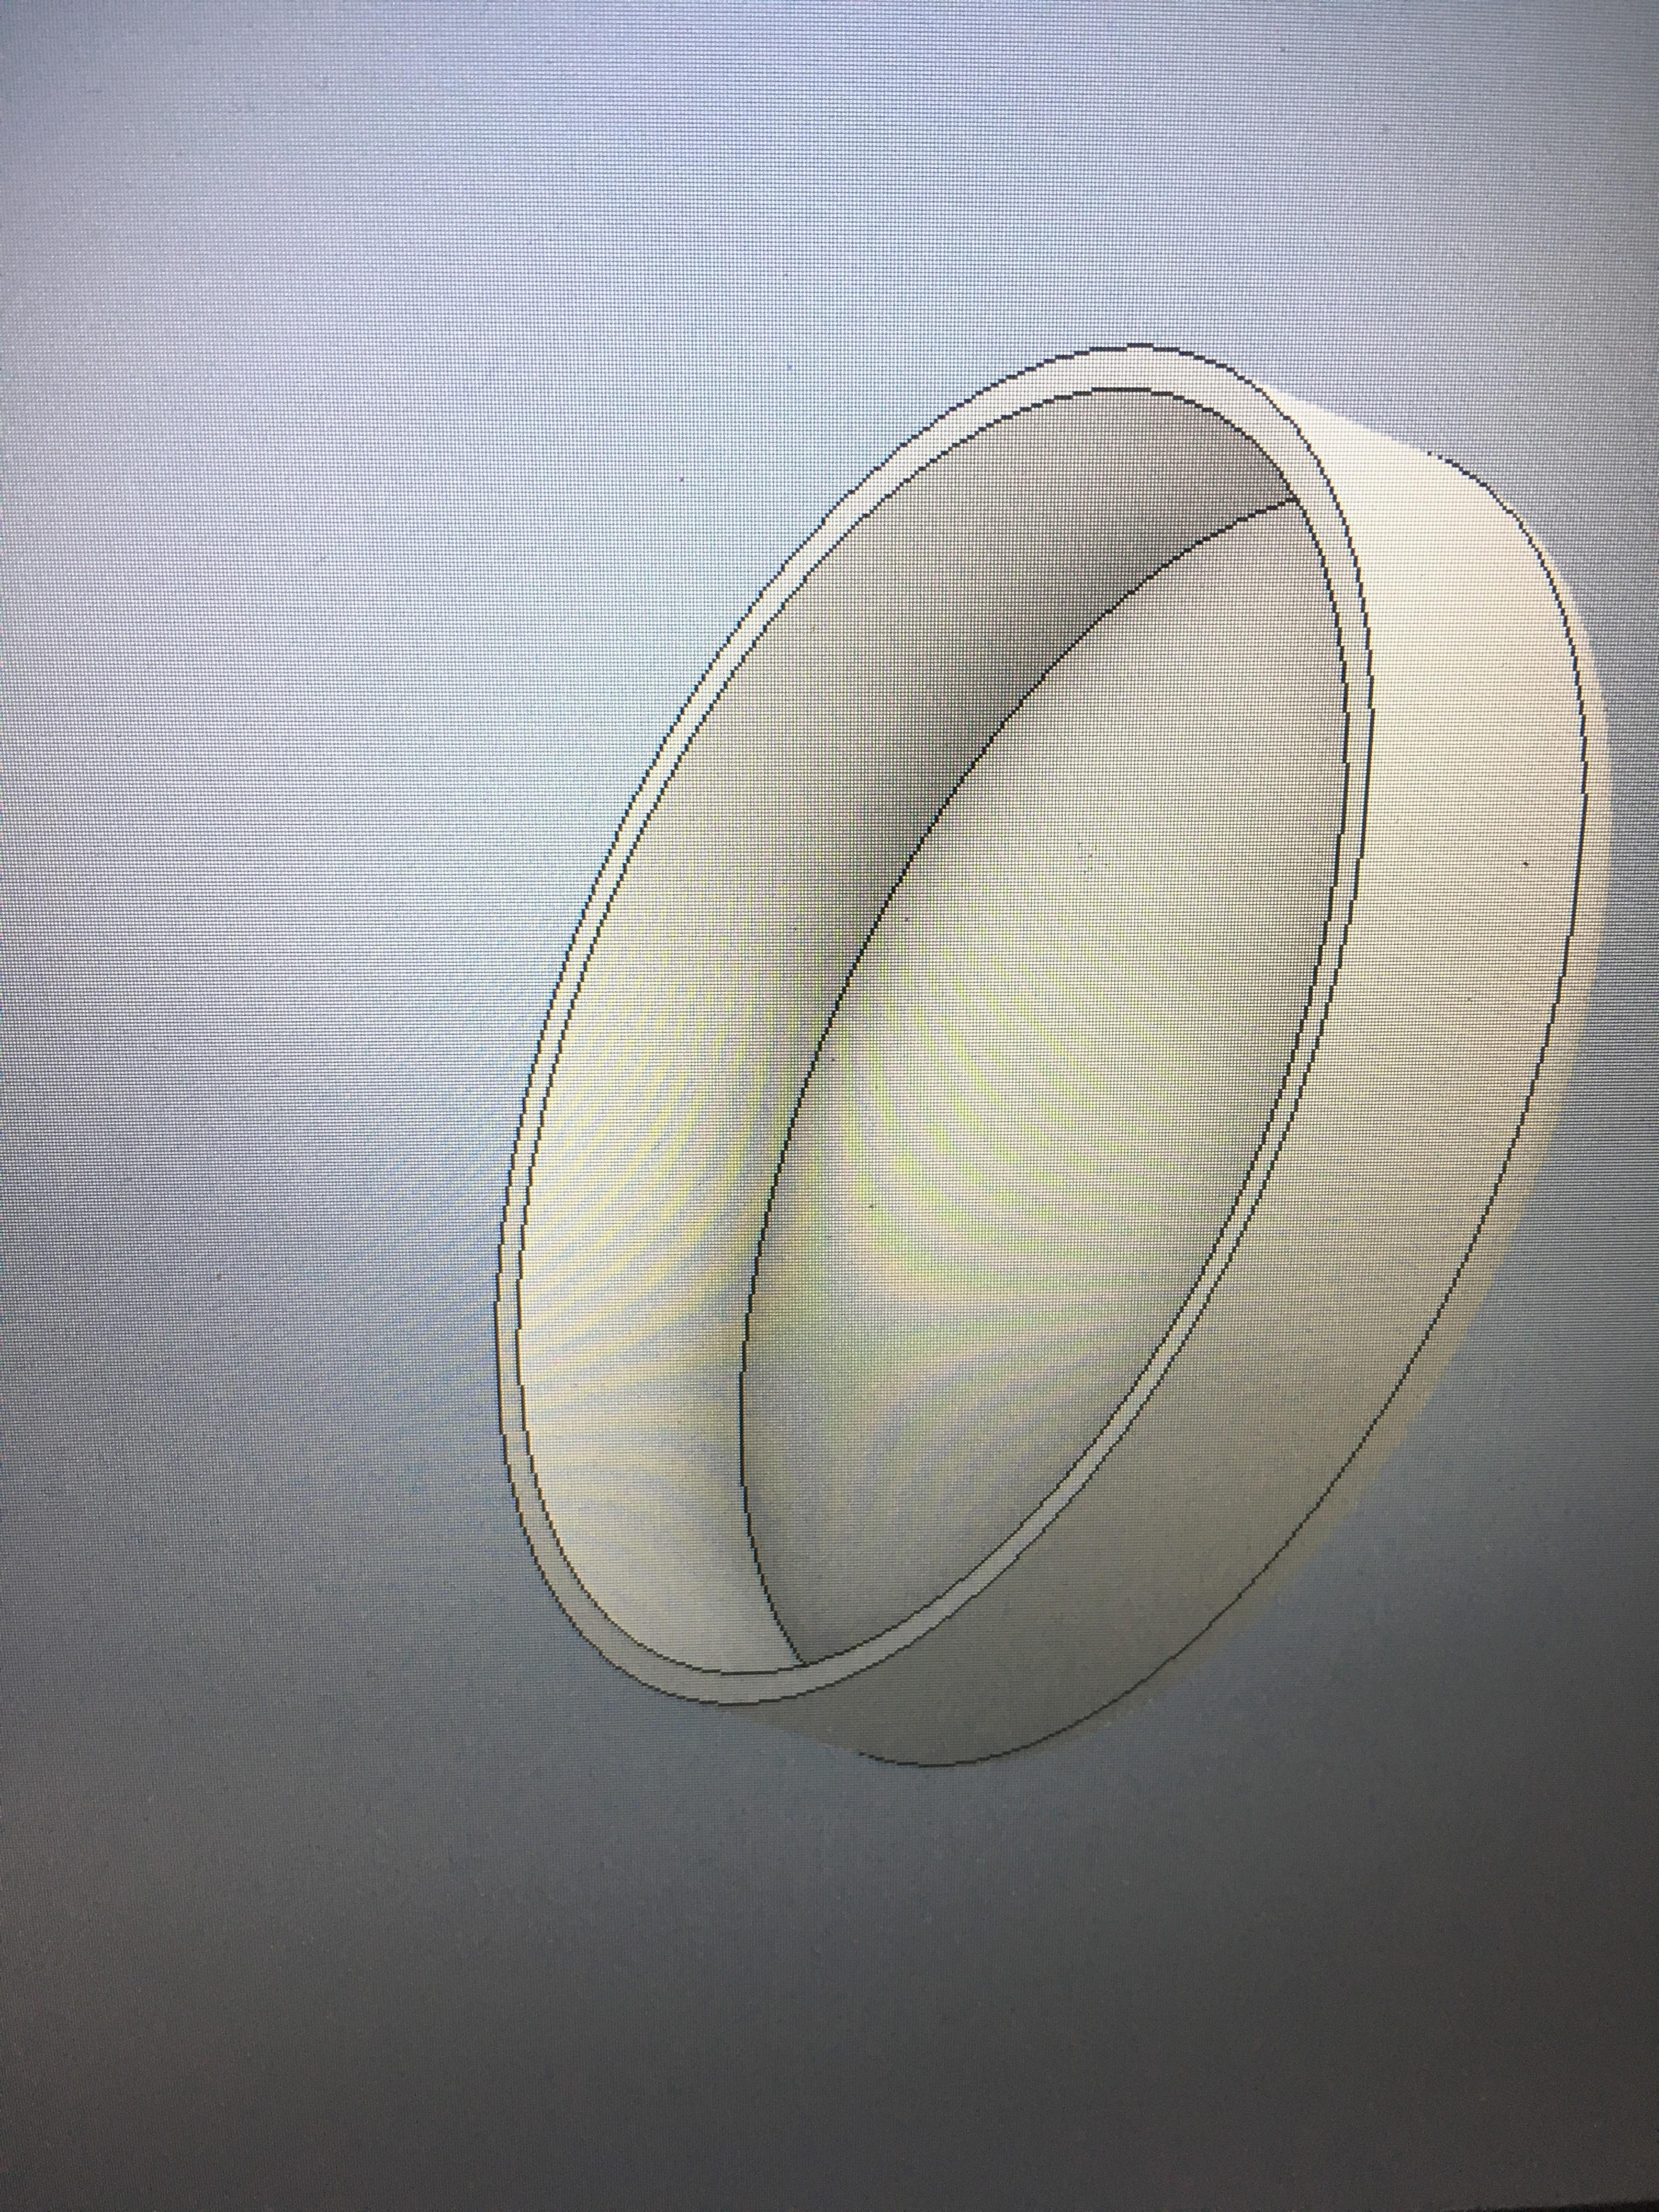 IMG_0221.JPG Download free STL file Prius Climate control knob cap • 3D print design, turnerw006